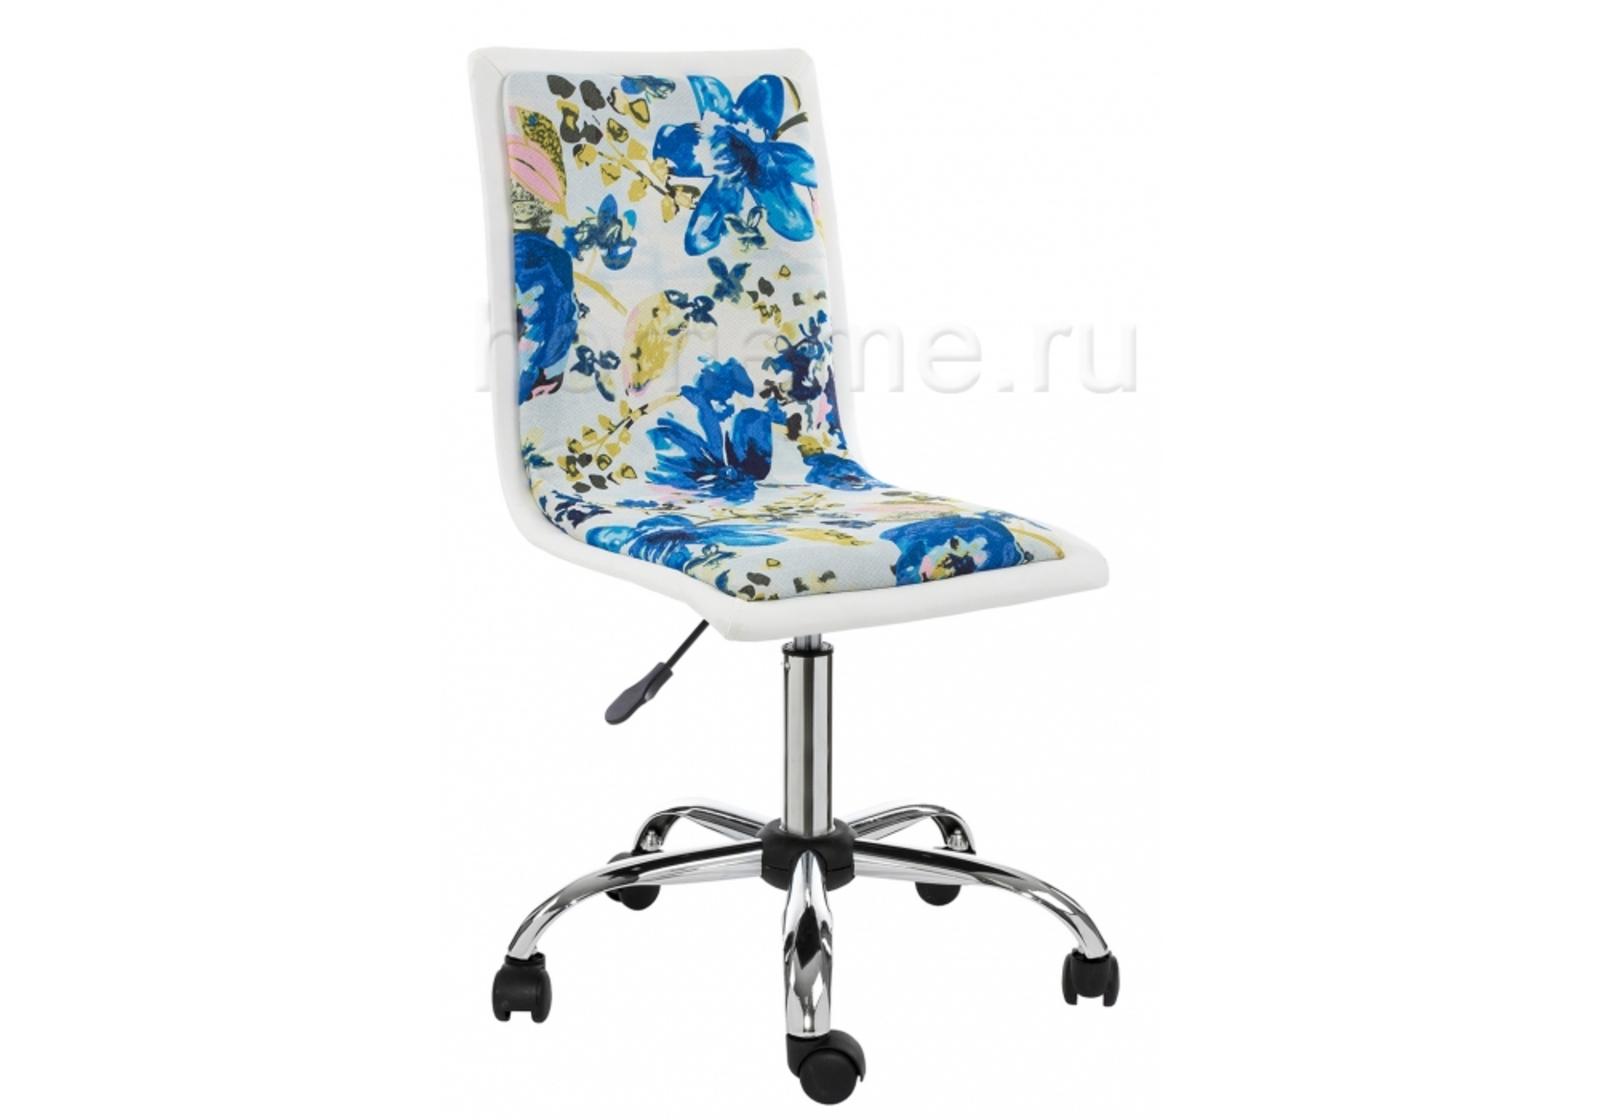 Кресло для офиса HomeMe Компьютерное кресло Mis white / flowers fabric 1925 от Homeme.ru